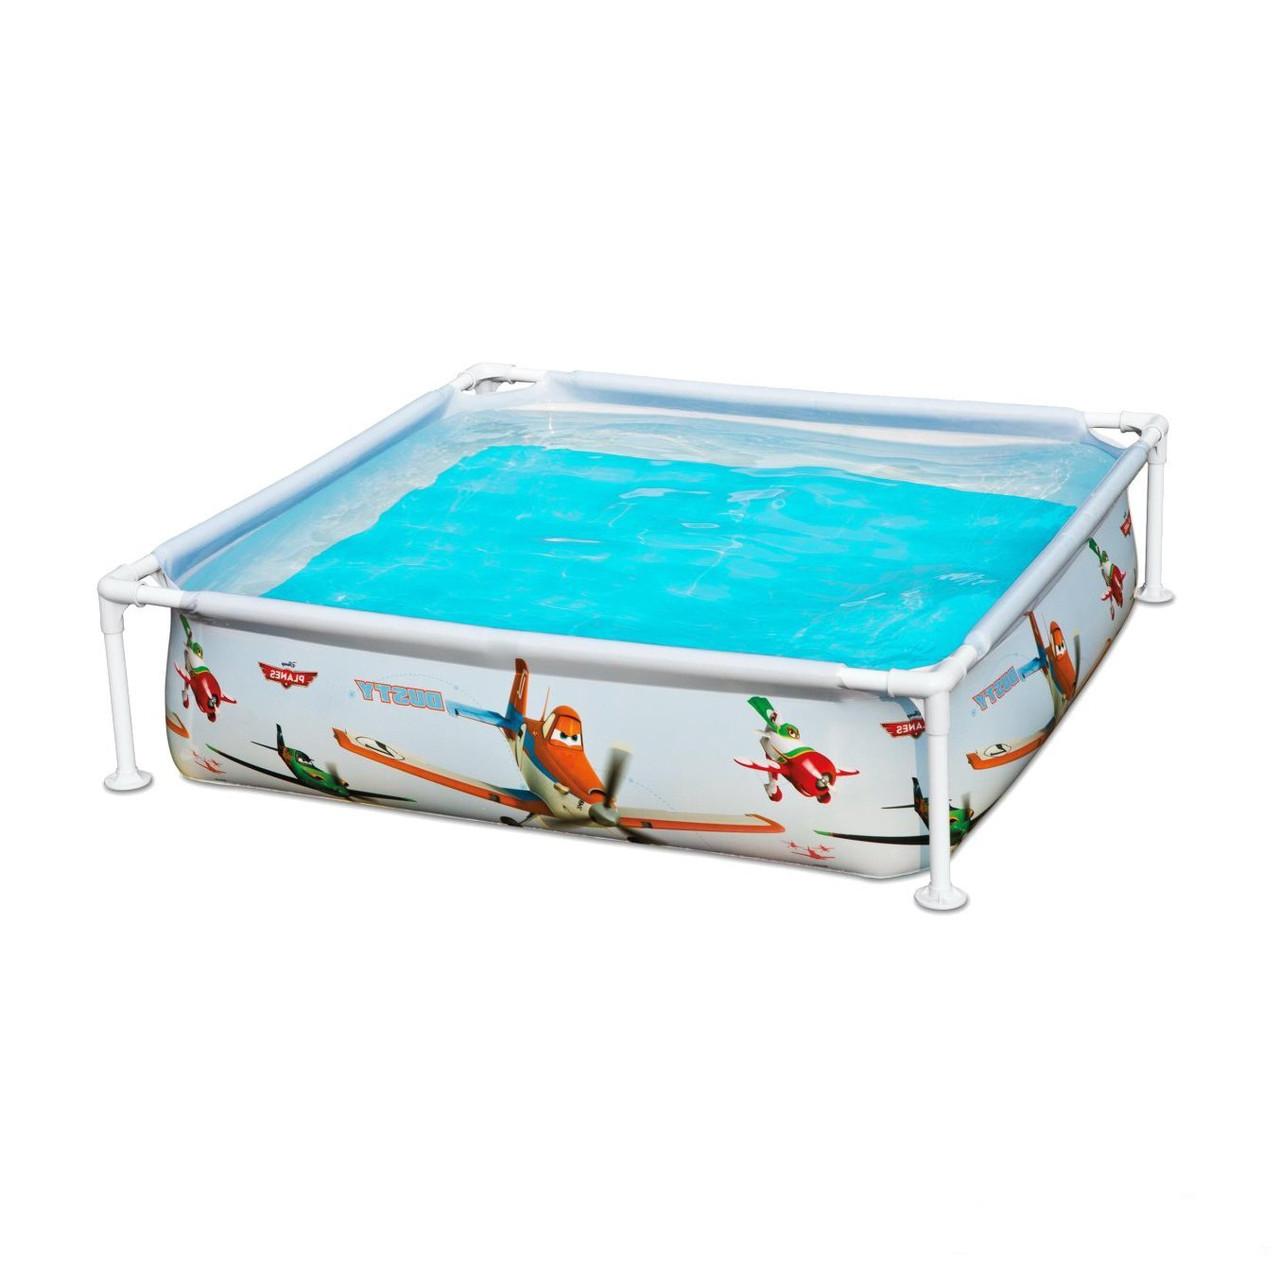 Каркасний басейн 122-122-30 смбасейн Intex 57174. Дитячий Small Frame